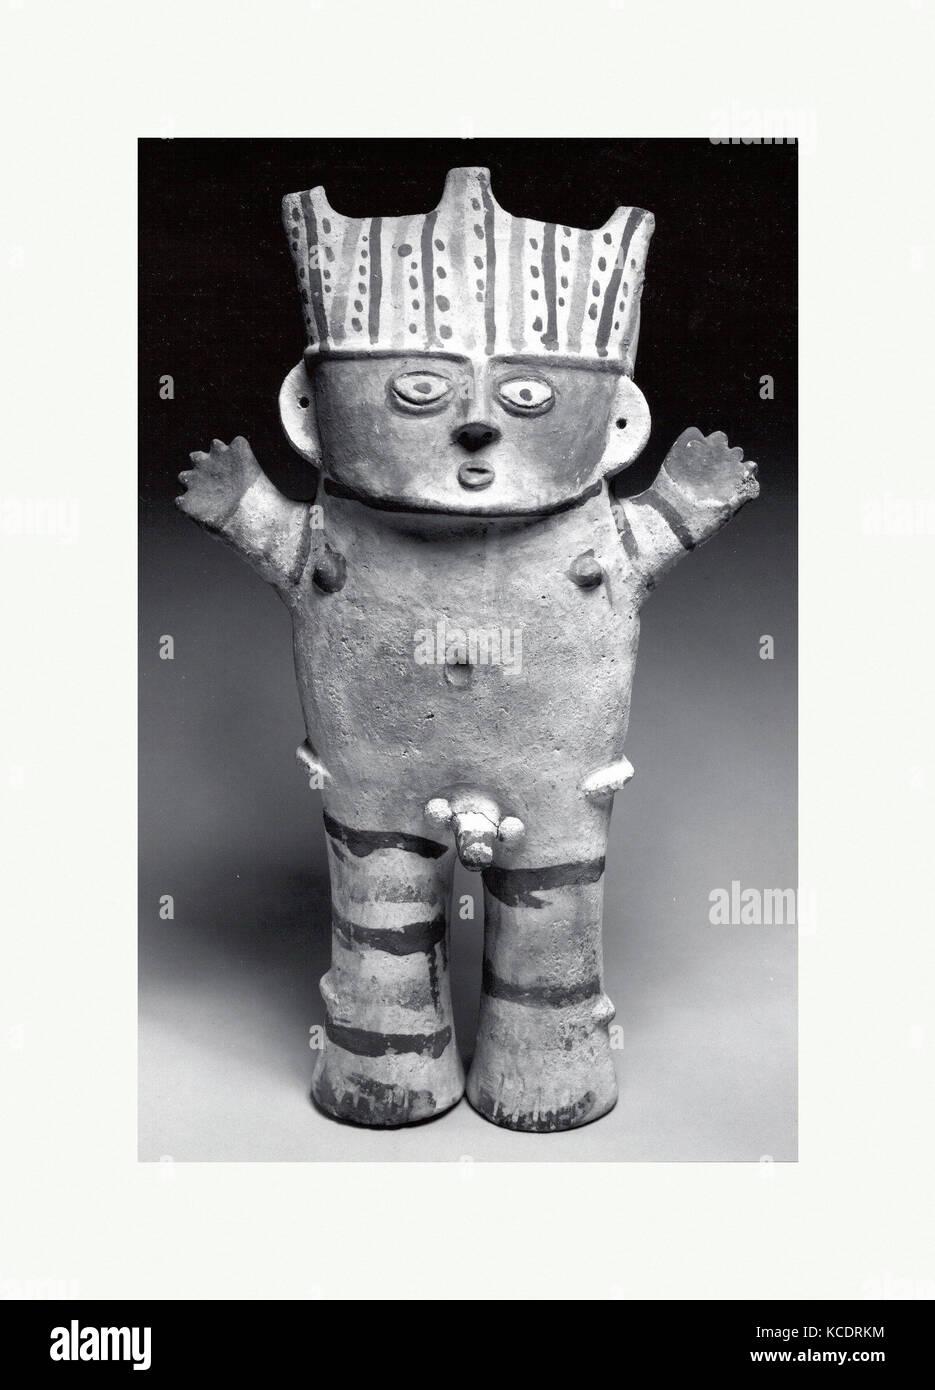 Standing Figure, 12th–14th century, Peru, Chancay, Ceramic, H. 18 1/2 in. (47 cm), Ceramics-Sculpture - Stock Image